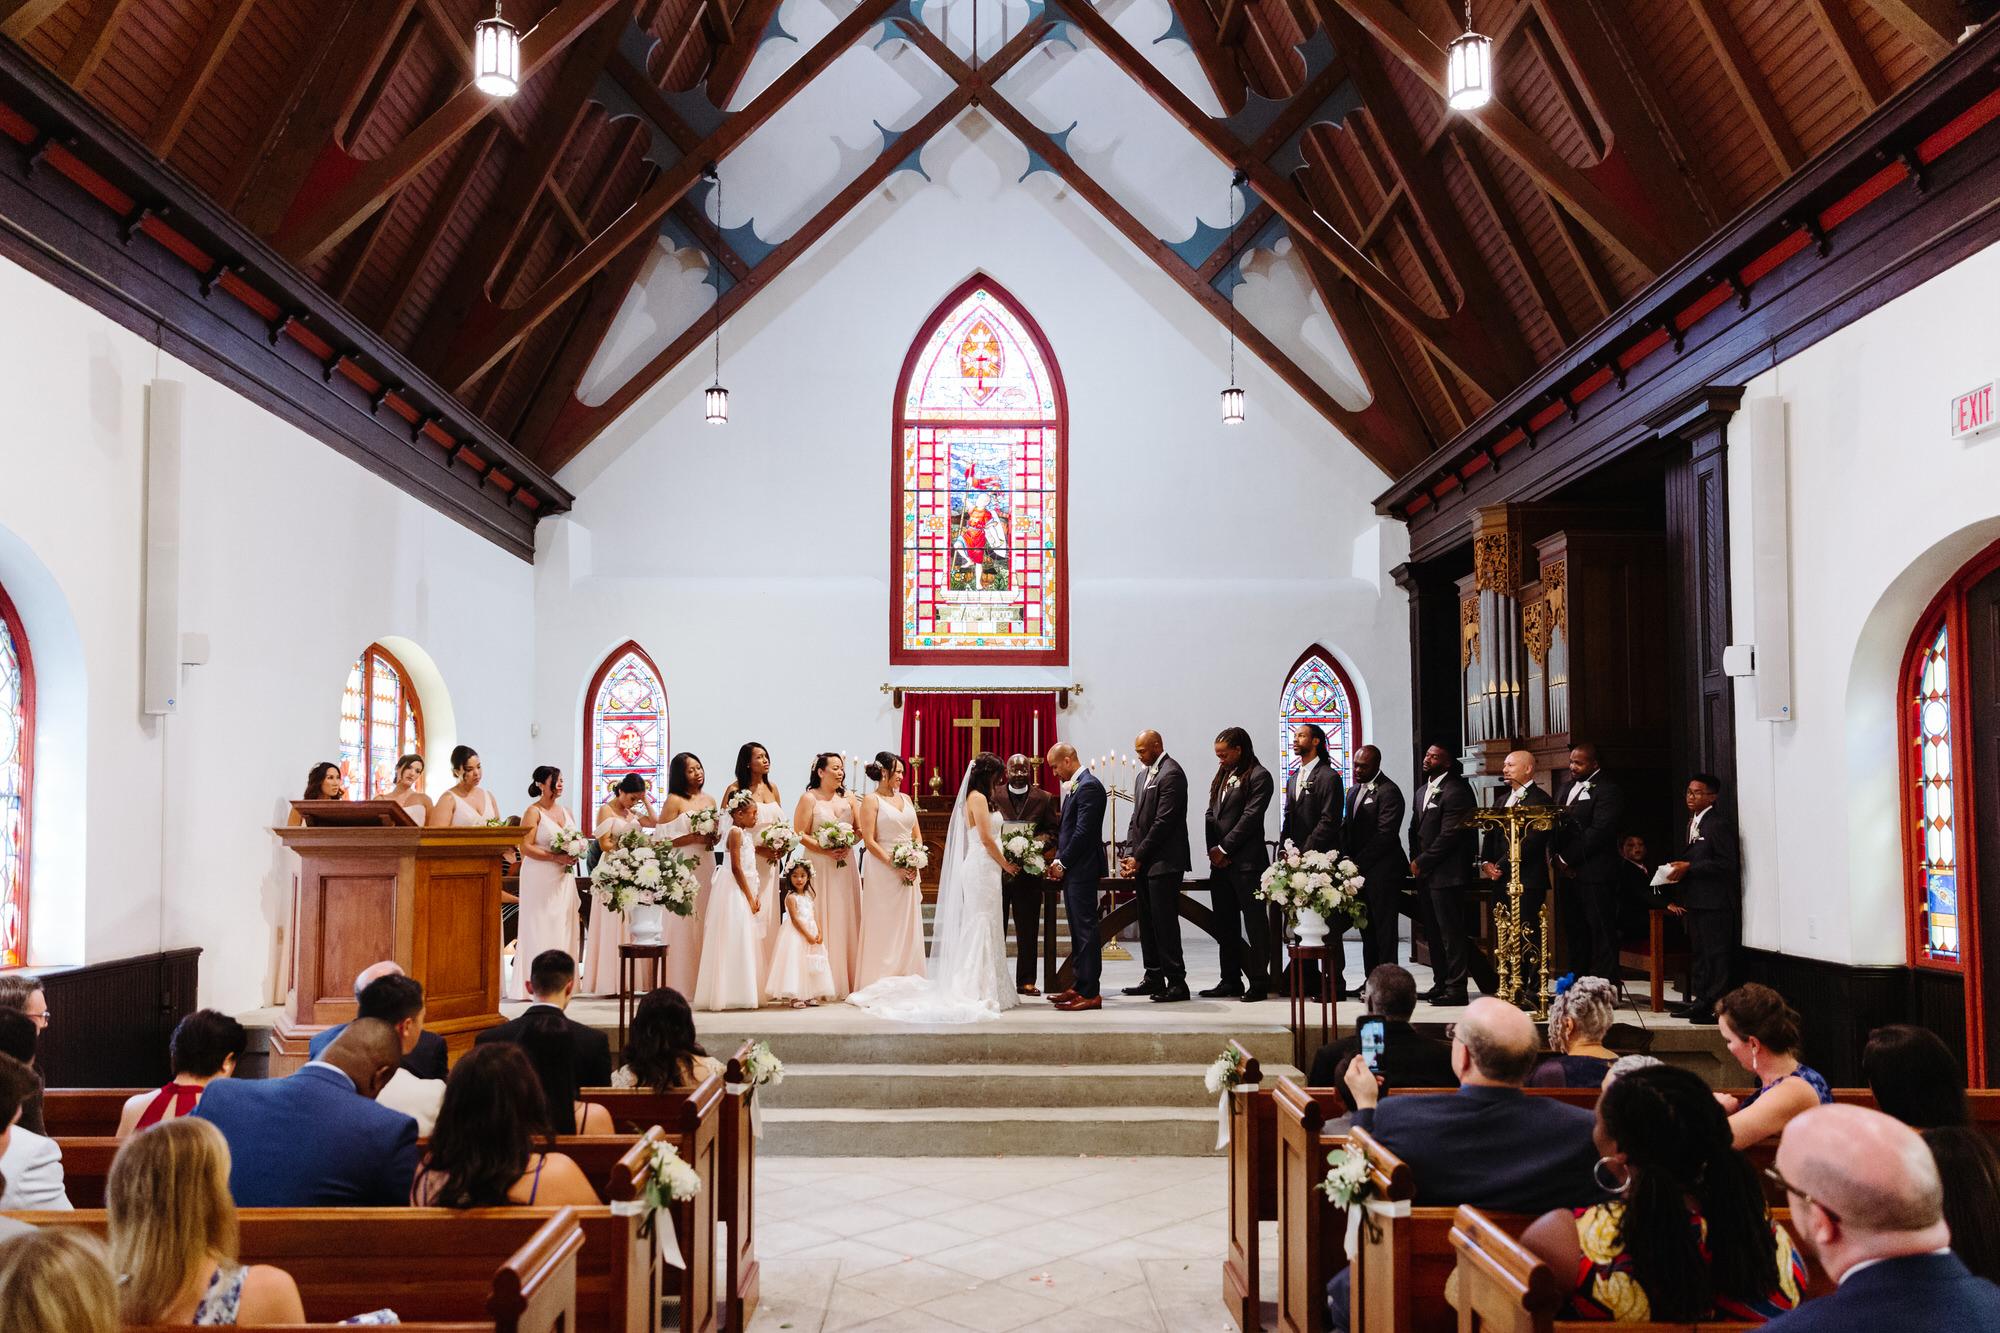 st-lukes-chapel-cannon-green-charleston-wedding-931.JPG